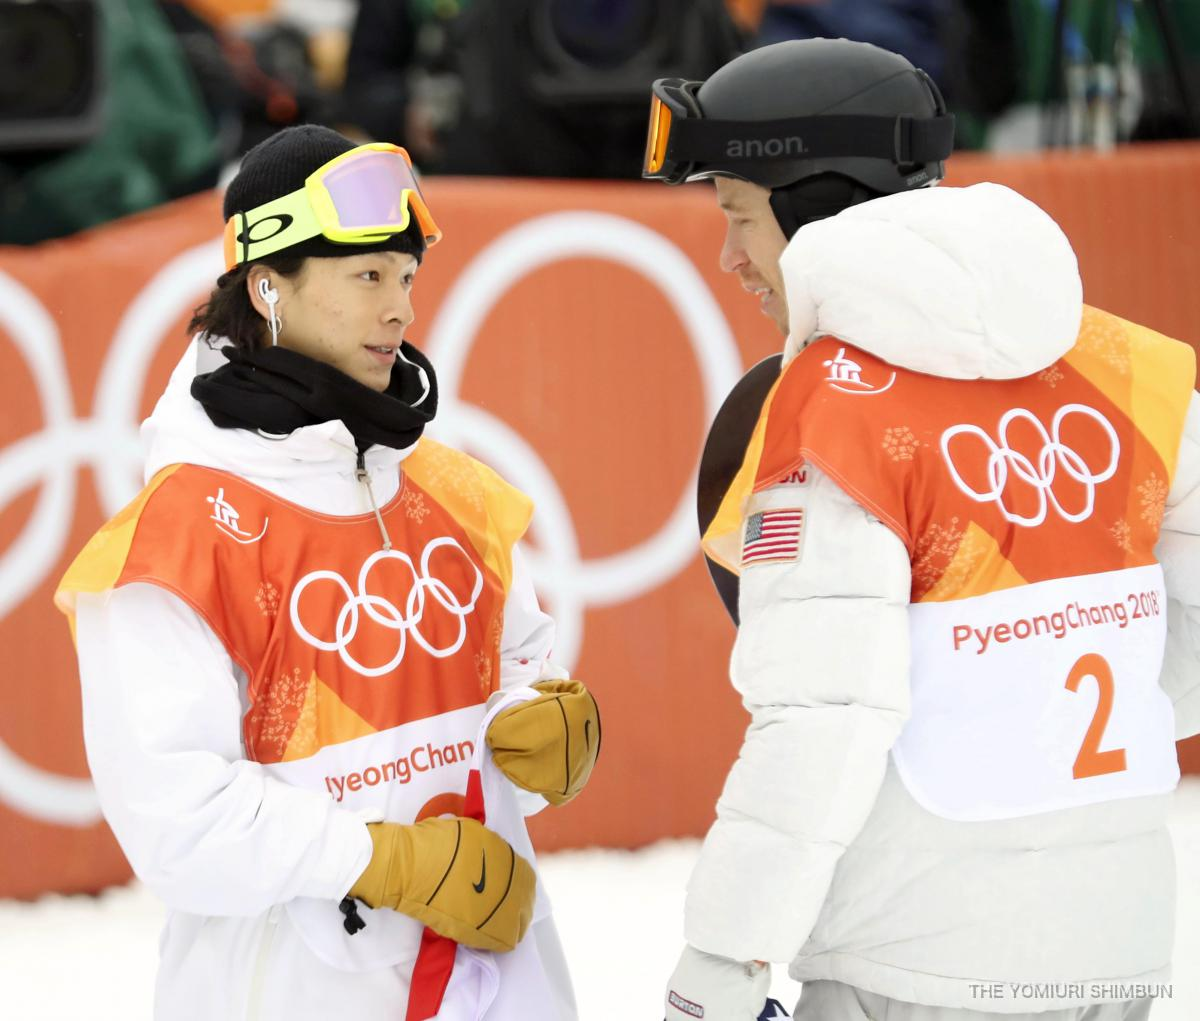 test ツイッターメディア - 【スノーボード】男子ハーフパイプ決勝、金メダルのショーン・ホワイトと言葉を交わす、銀メダルの #平野歩夢 。 #平昌オリンピック #オリンピック #スノーボード #ハーフパイプ https://t.co/OwU50XnXXy